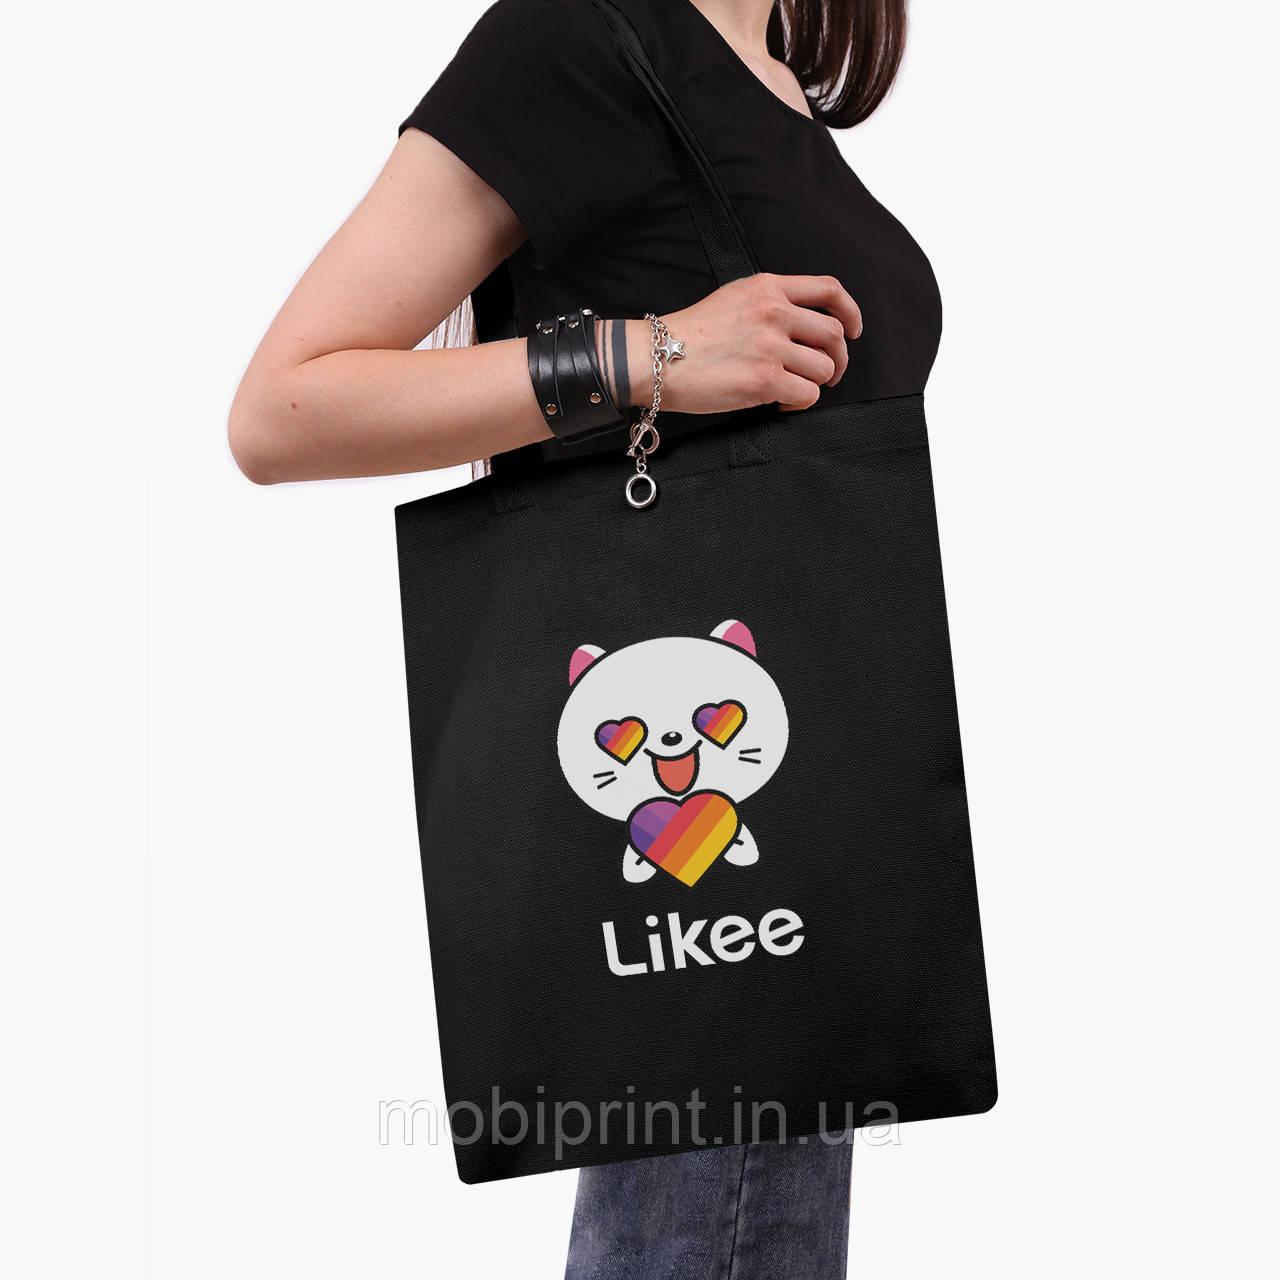 Еко сумка шоппер чорна Лайк Котик (Likee Cat) (9227-1036-2) екосумка шопер 41*35 см